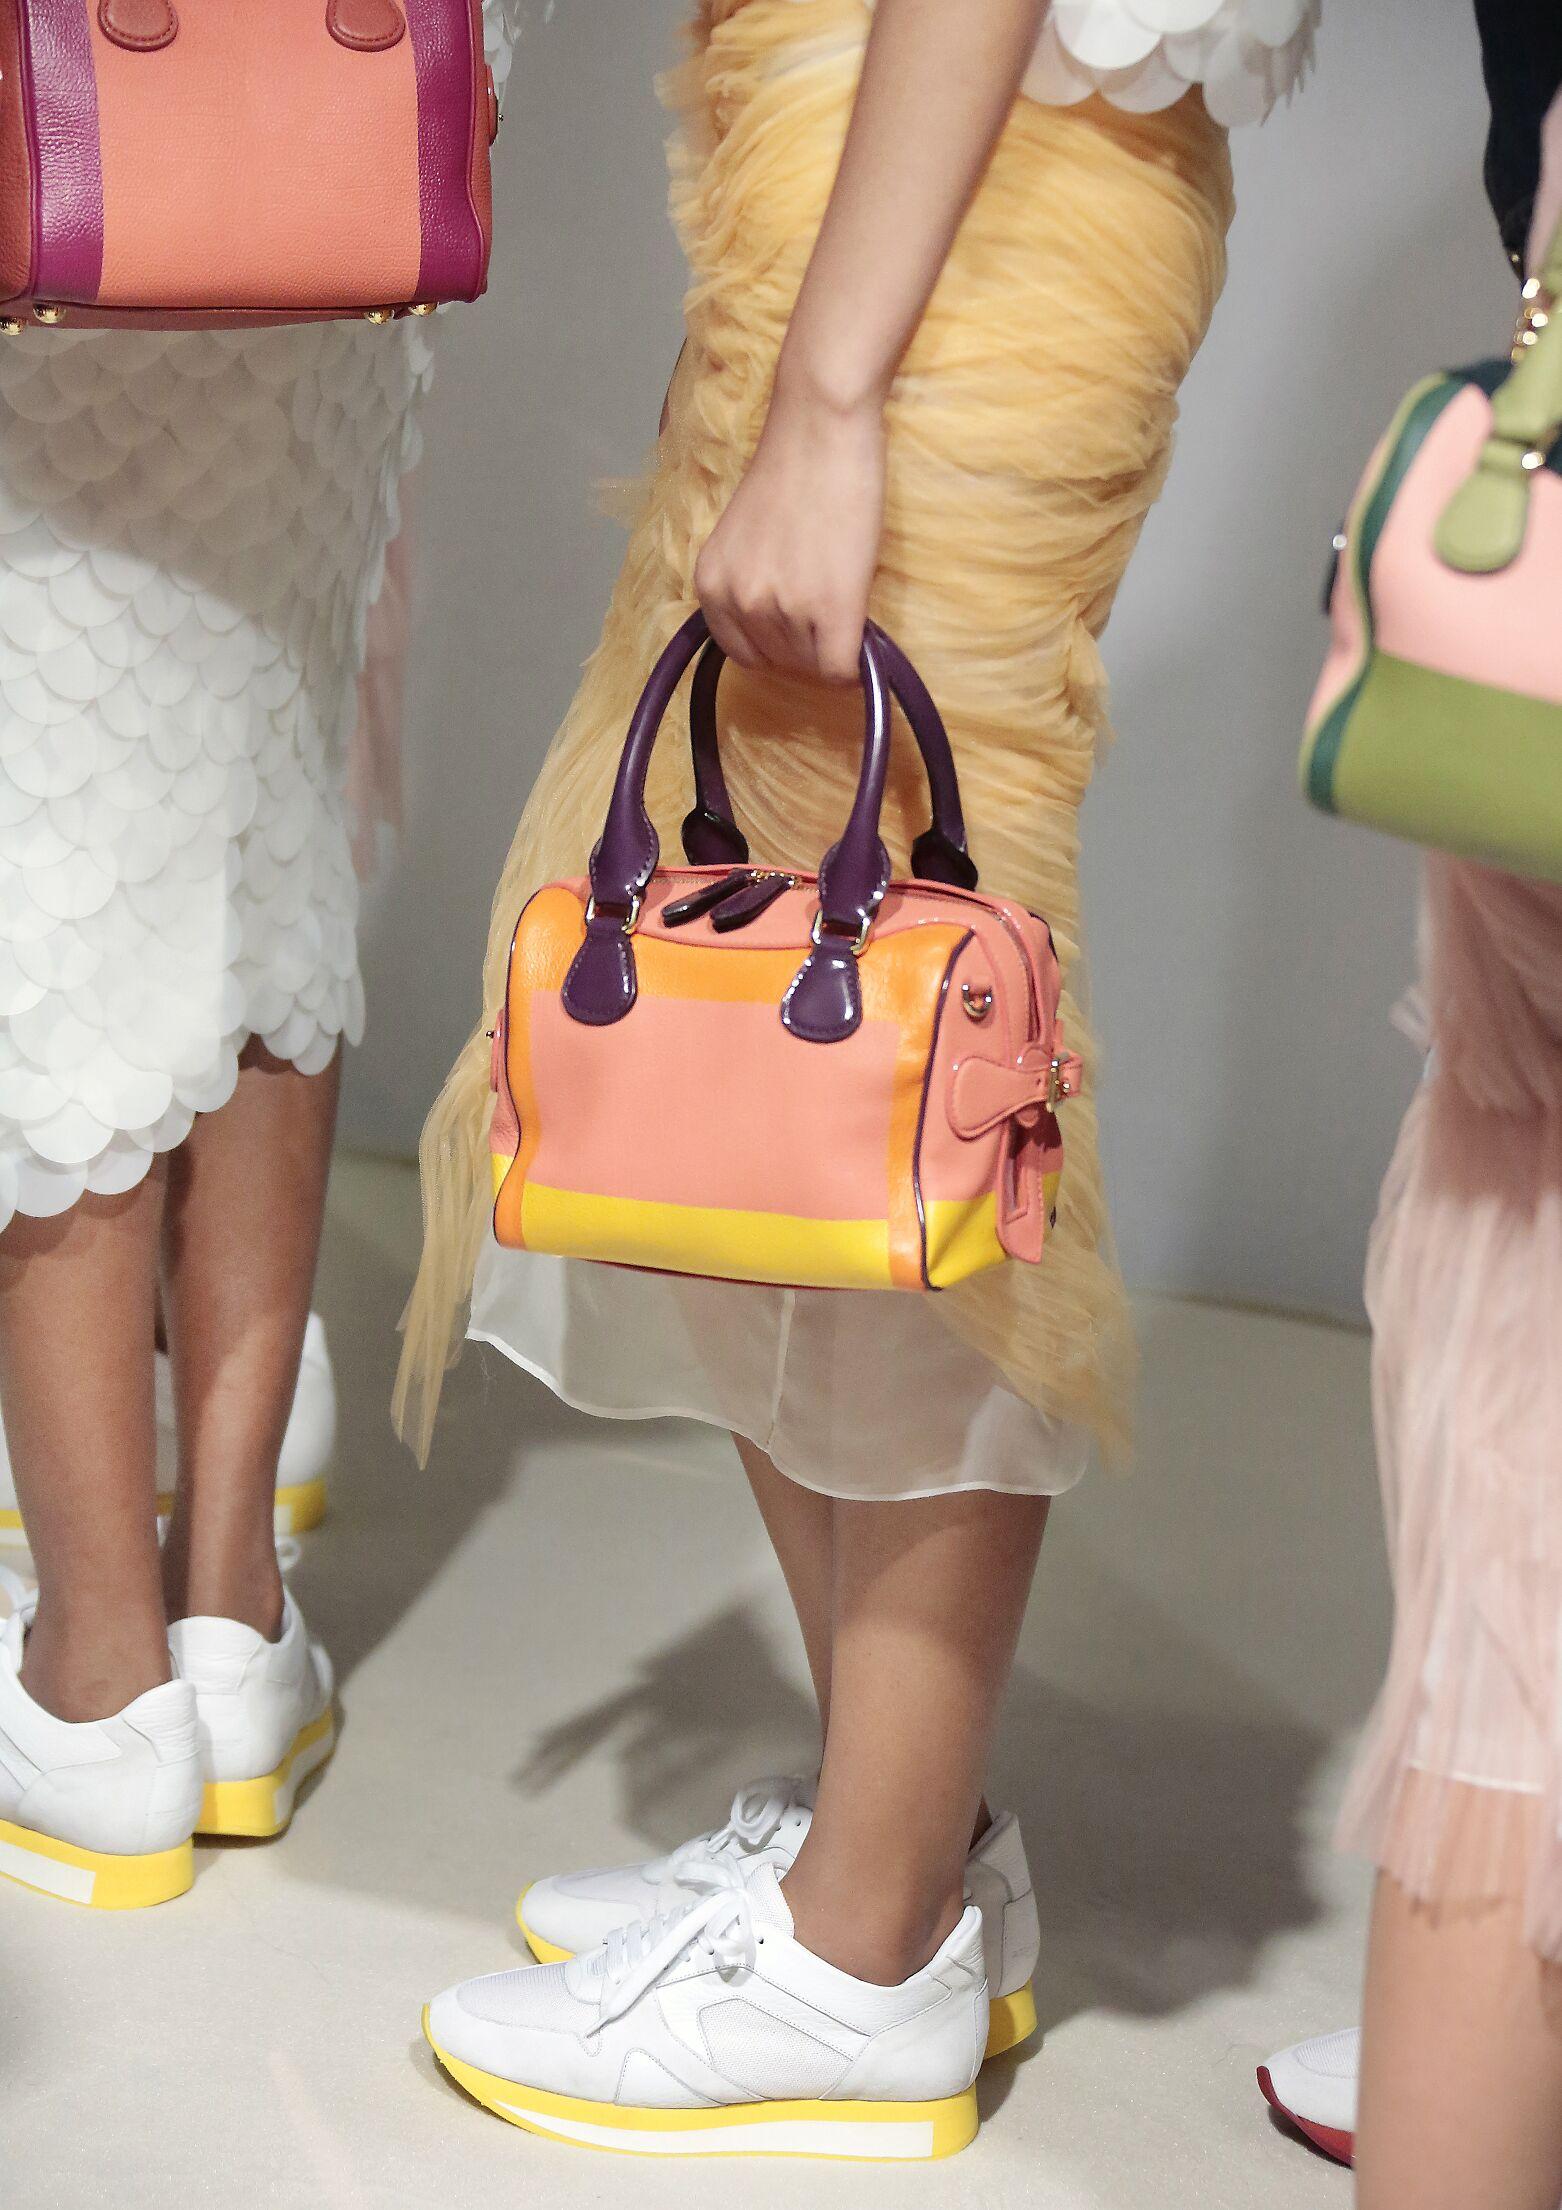 Fashion Model Backstage Burberry Prorsum Bag